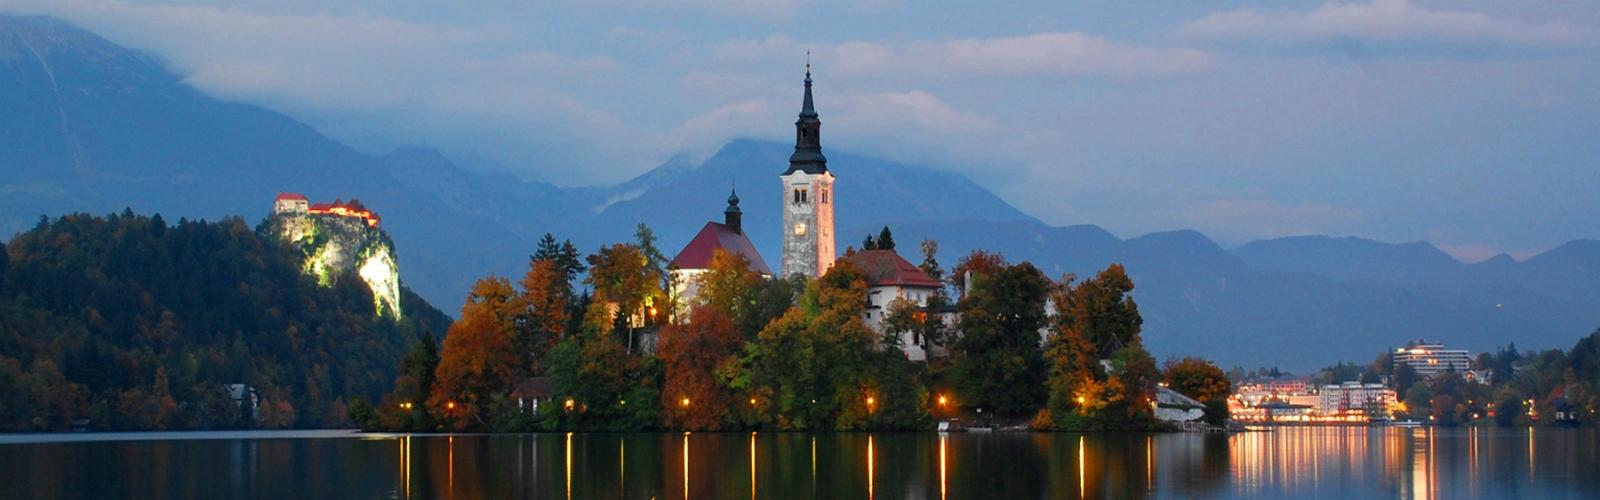 Hotels in het prachtige Slovenië